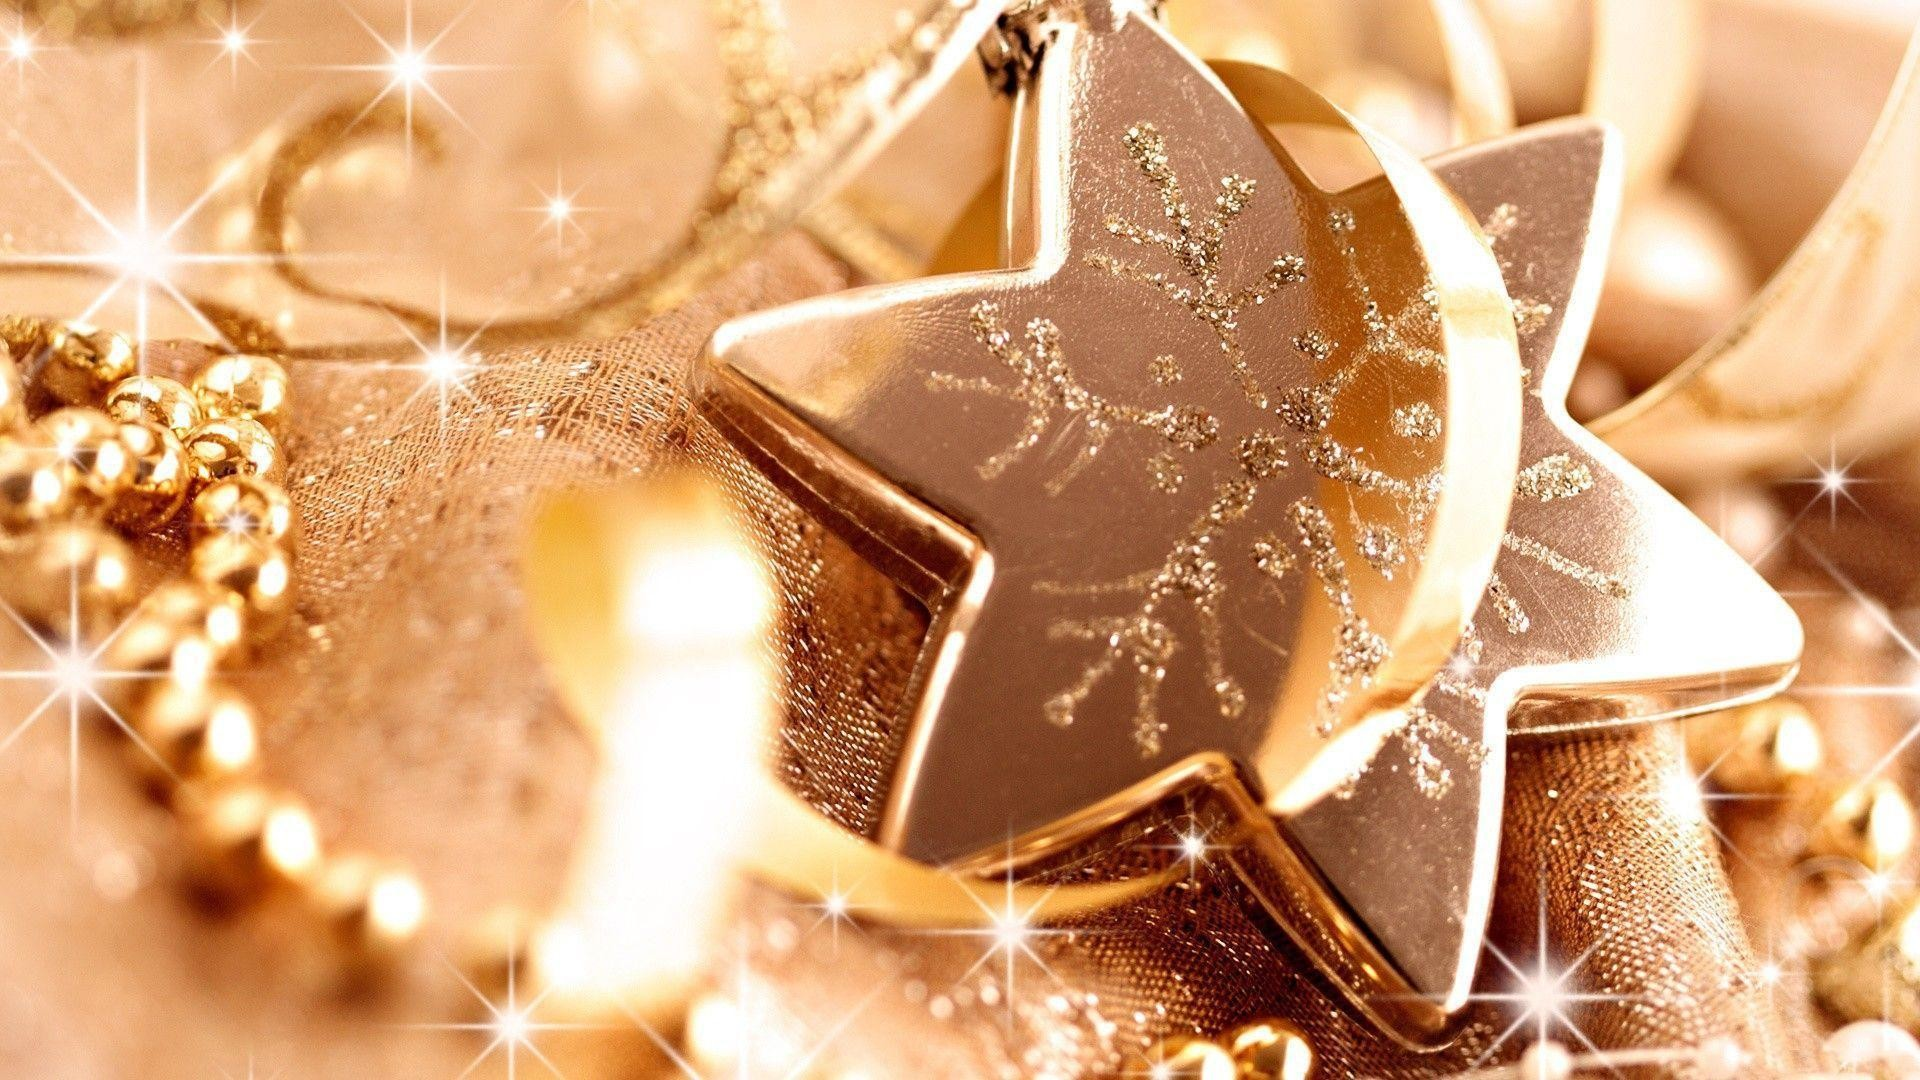 Christmas HD Wallpapers 1080p – HD Wallpapers Inn